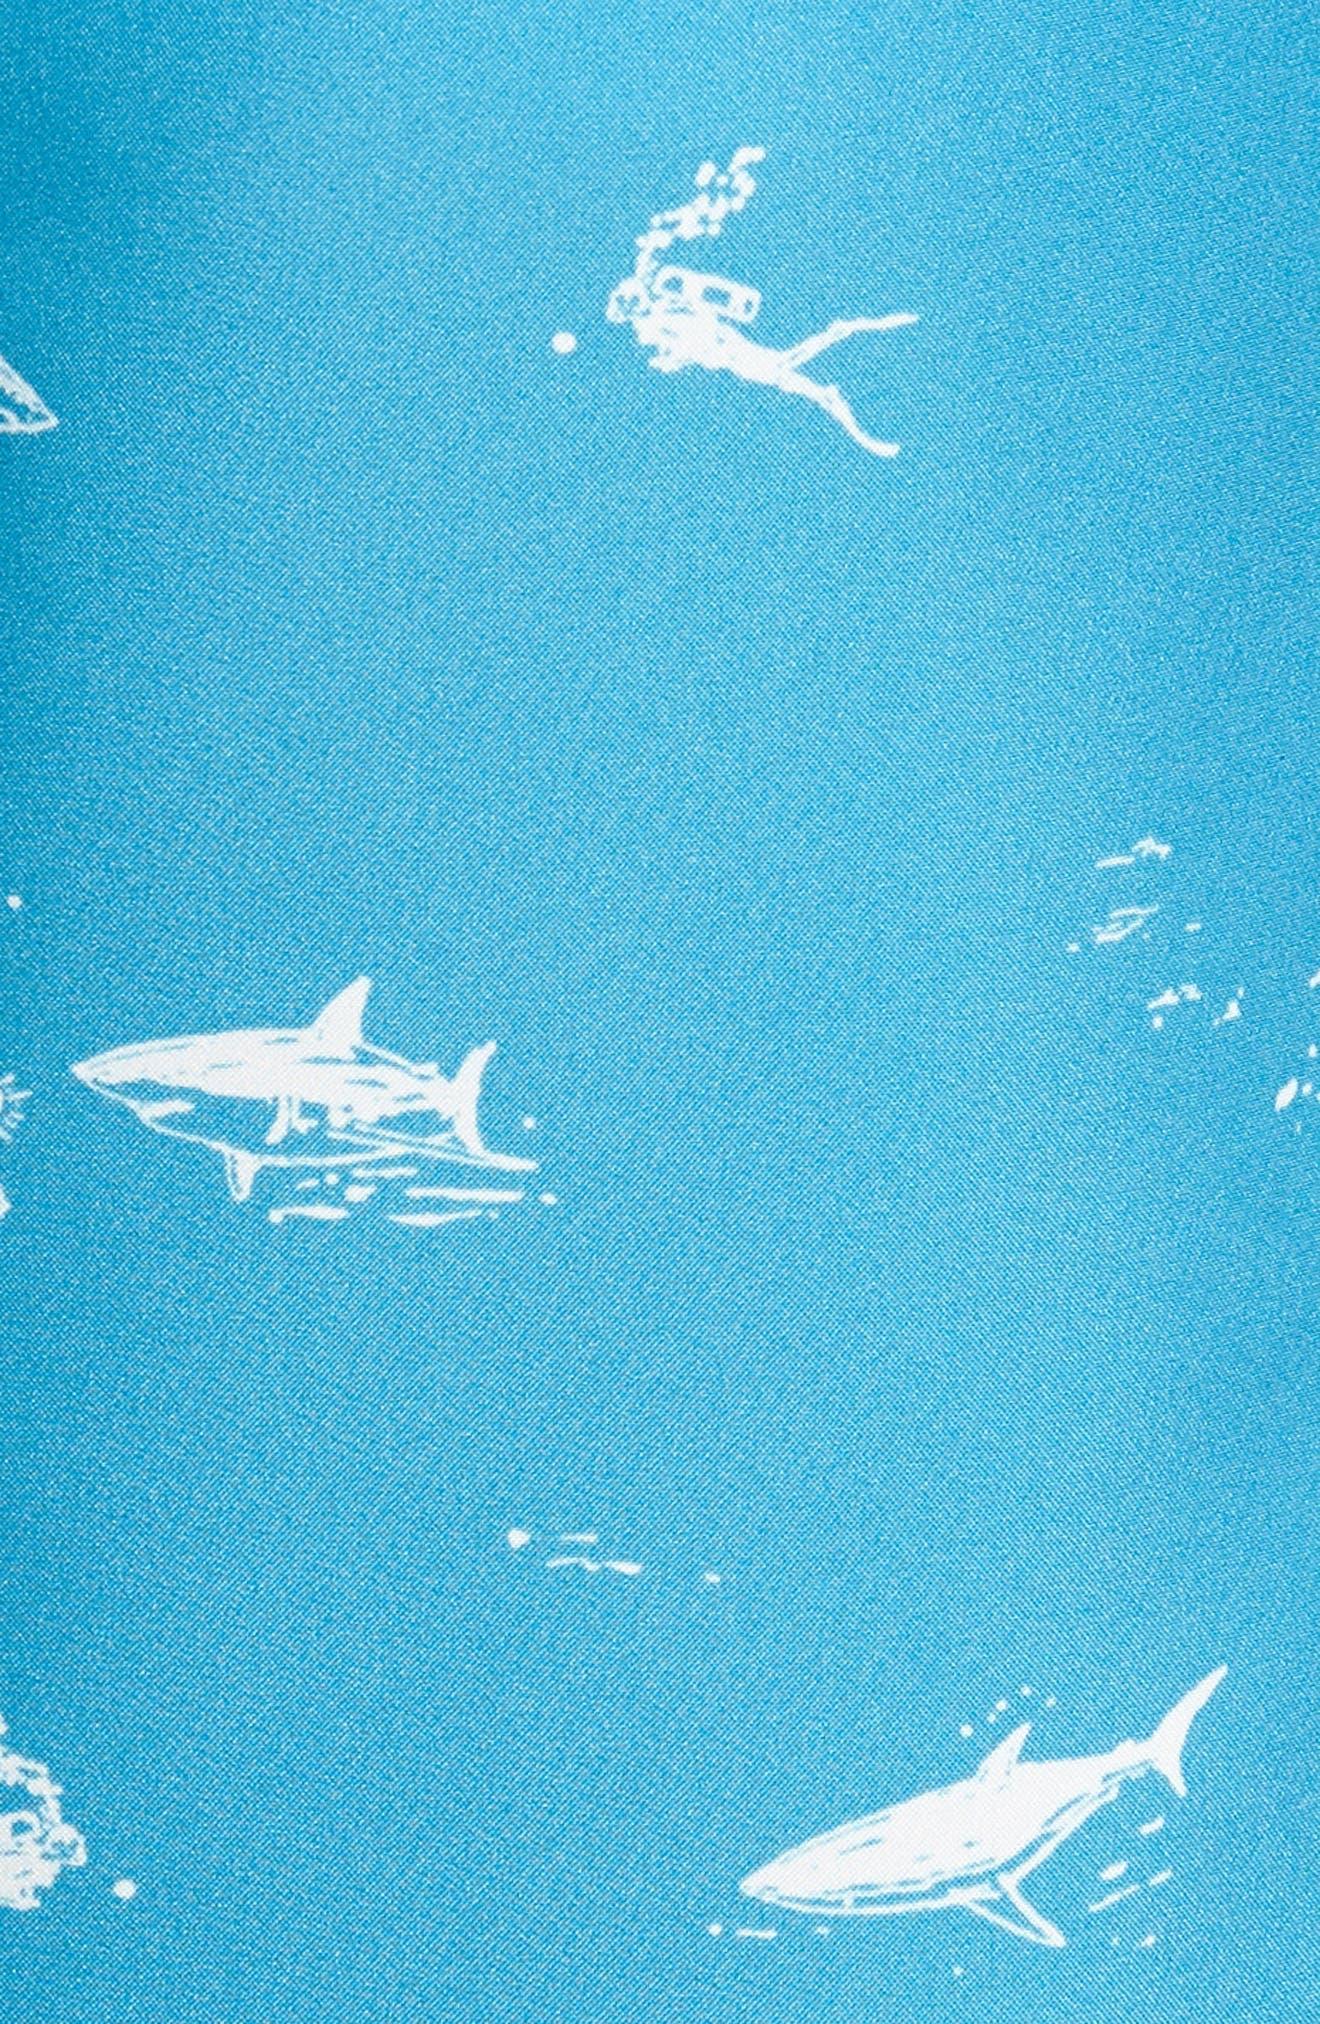 Banzai 9-Inch Swim Trunks,                             Alternate thumbnail 5, color,                             300